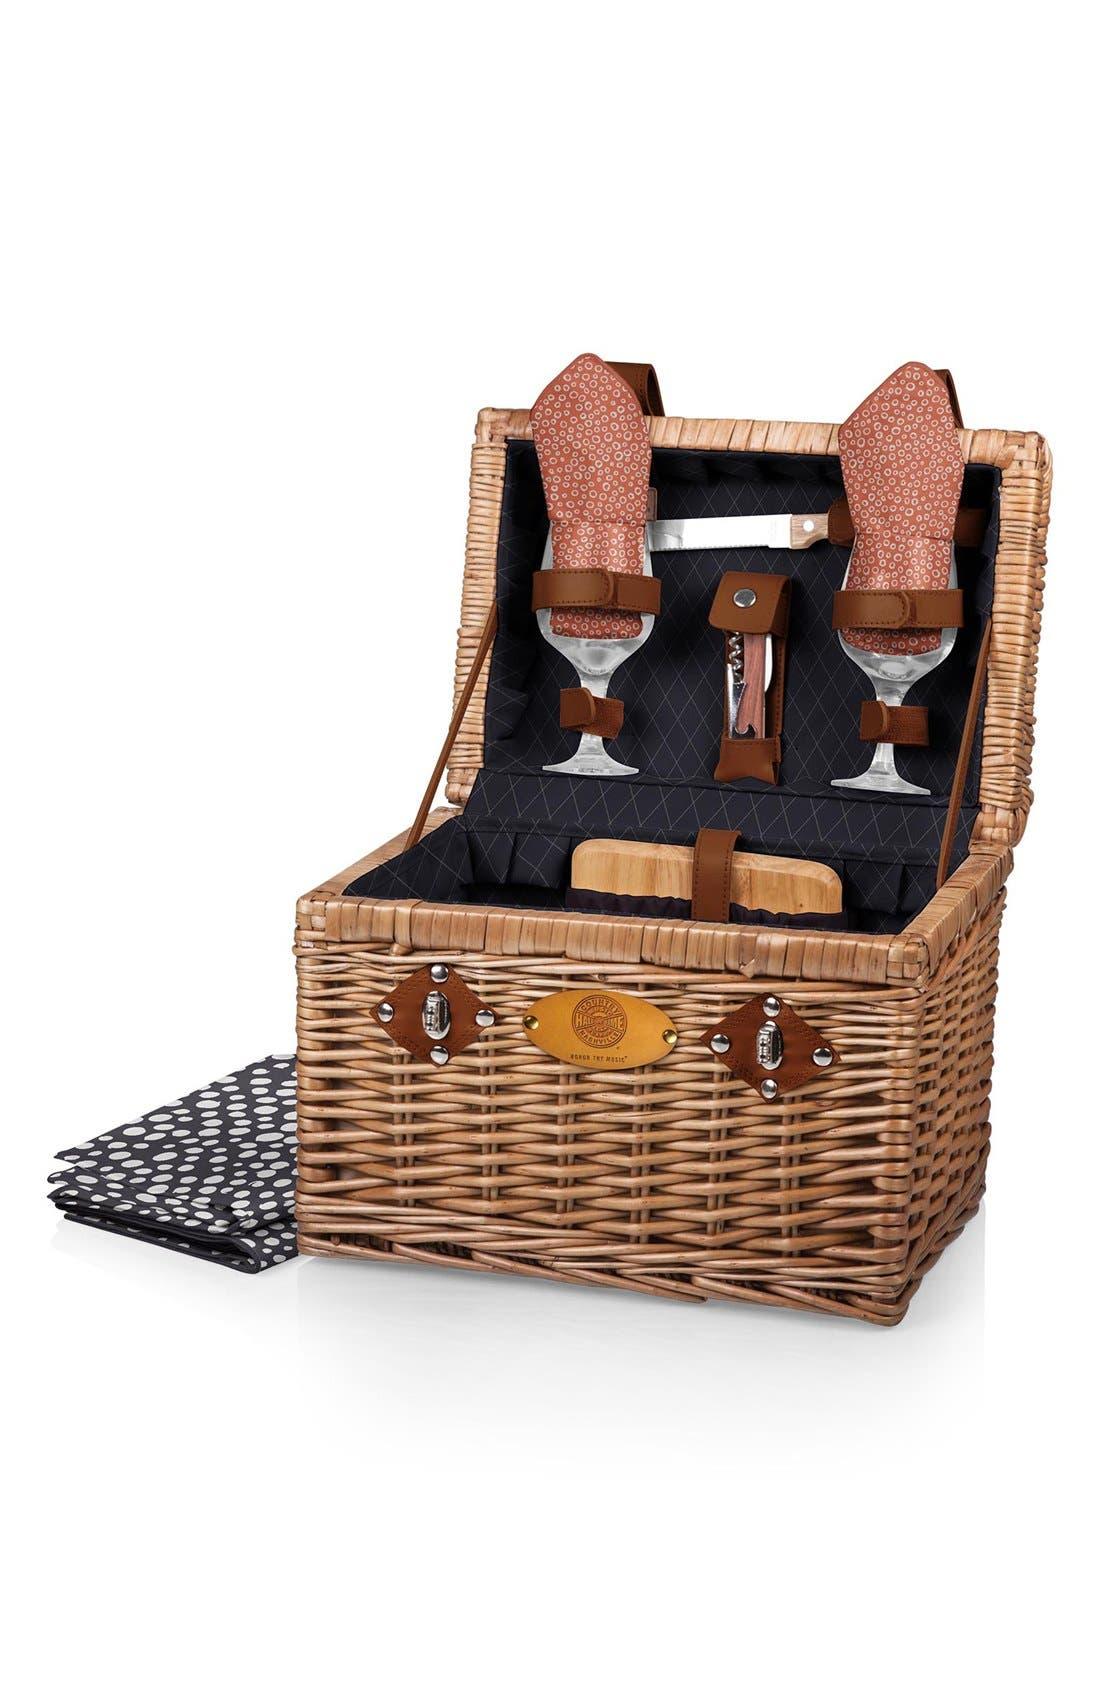 Alternate Image 1 Selected - Picnic Time 'Napa' Wicker Picnic Basket